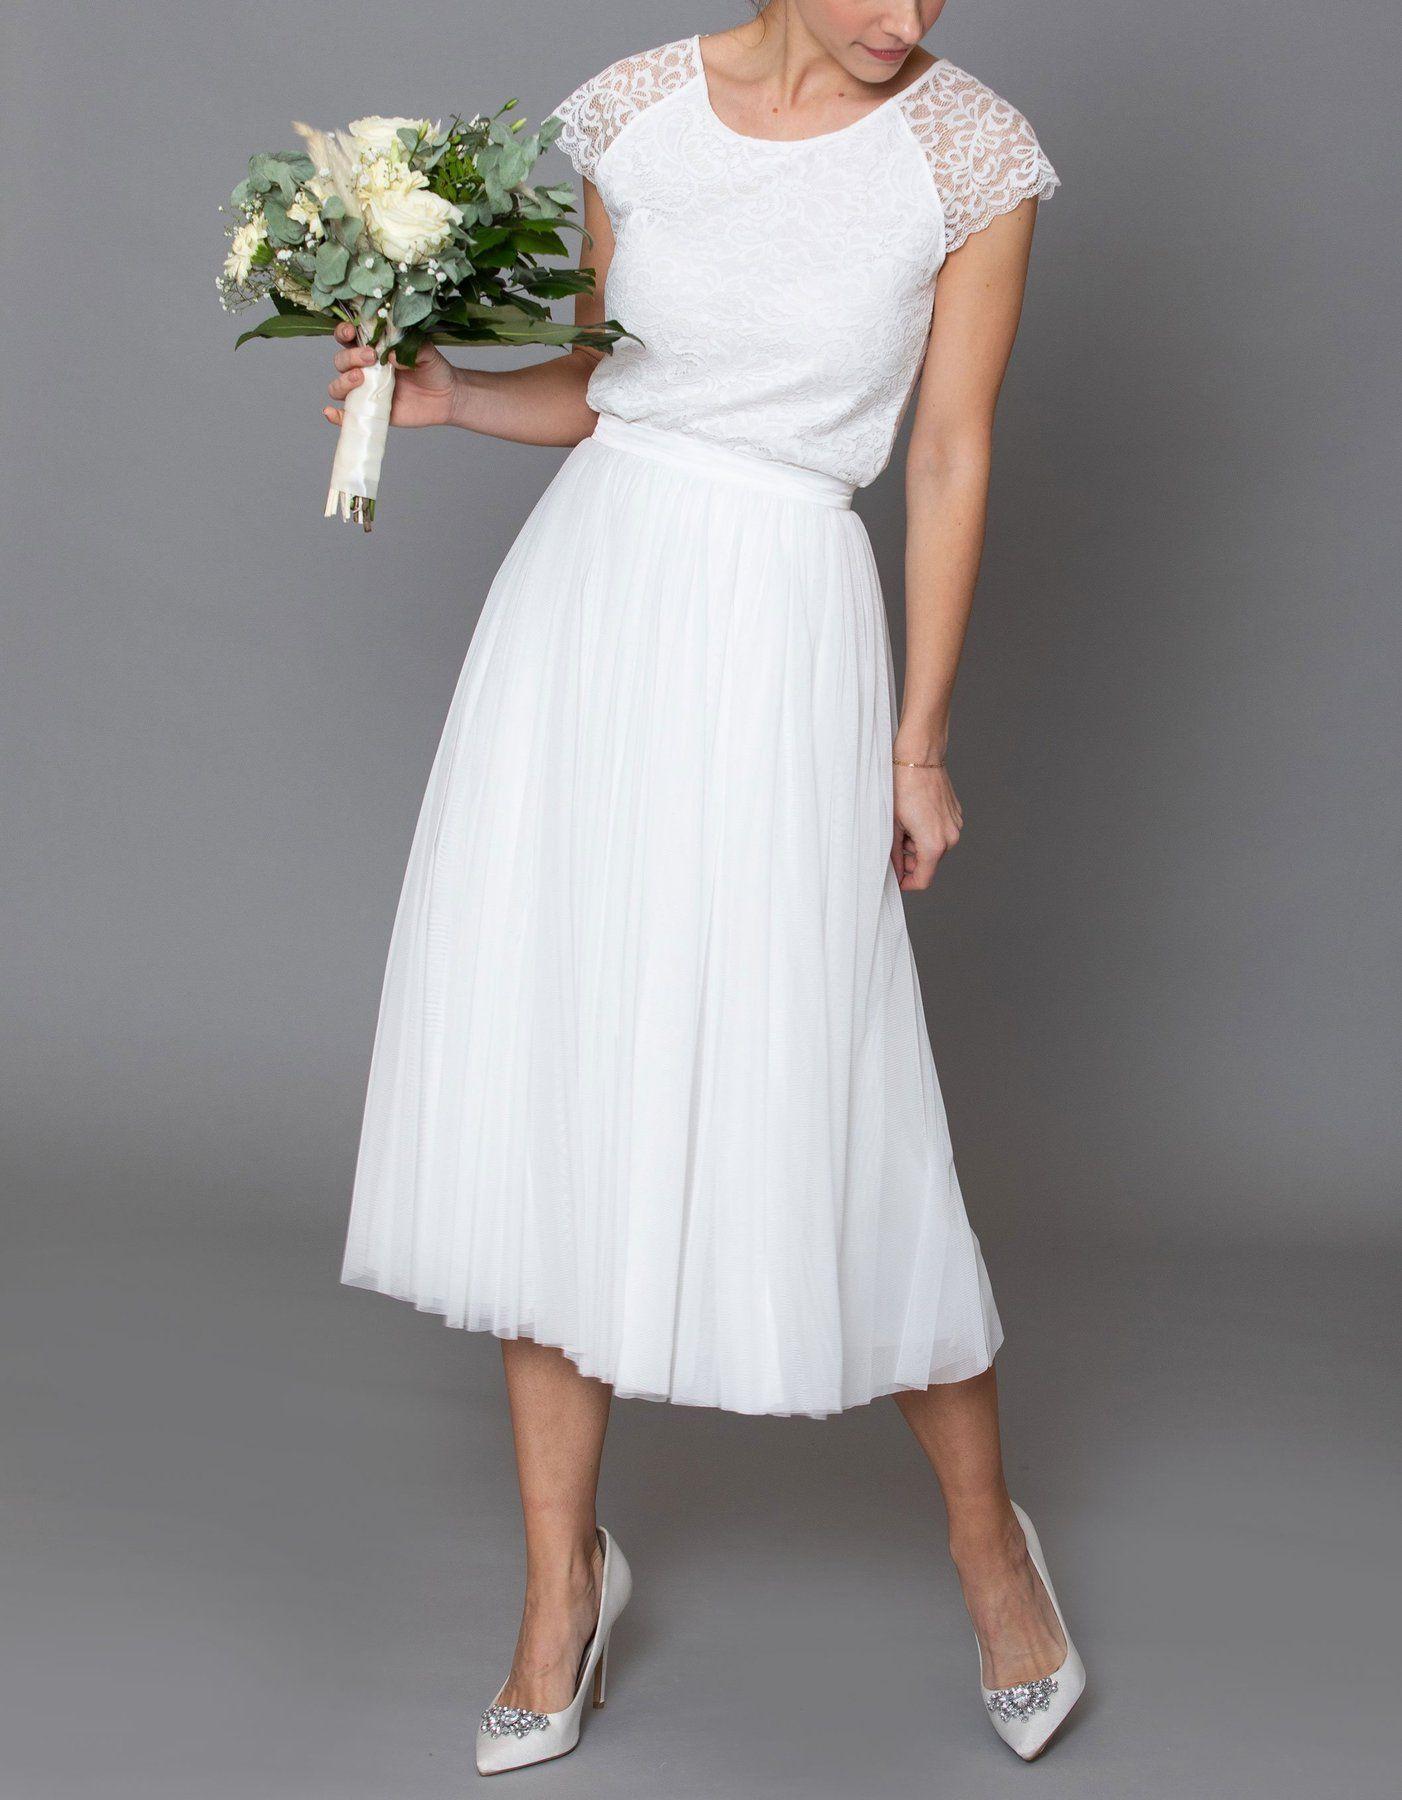 CONSTANT LOVE Tüll Rock Braut Midi - Bekleidung in 11  Kleid